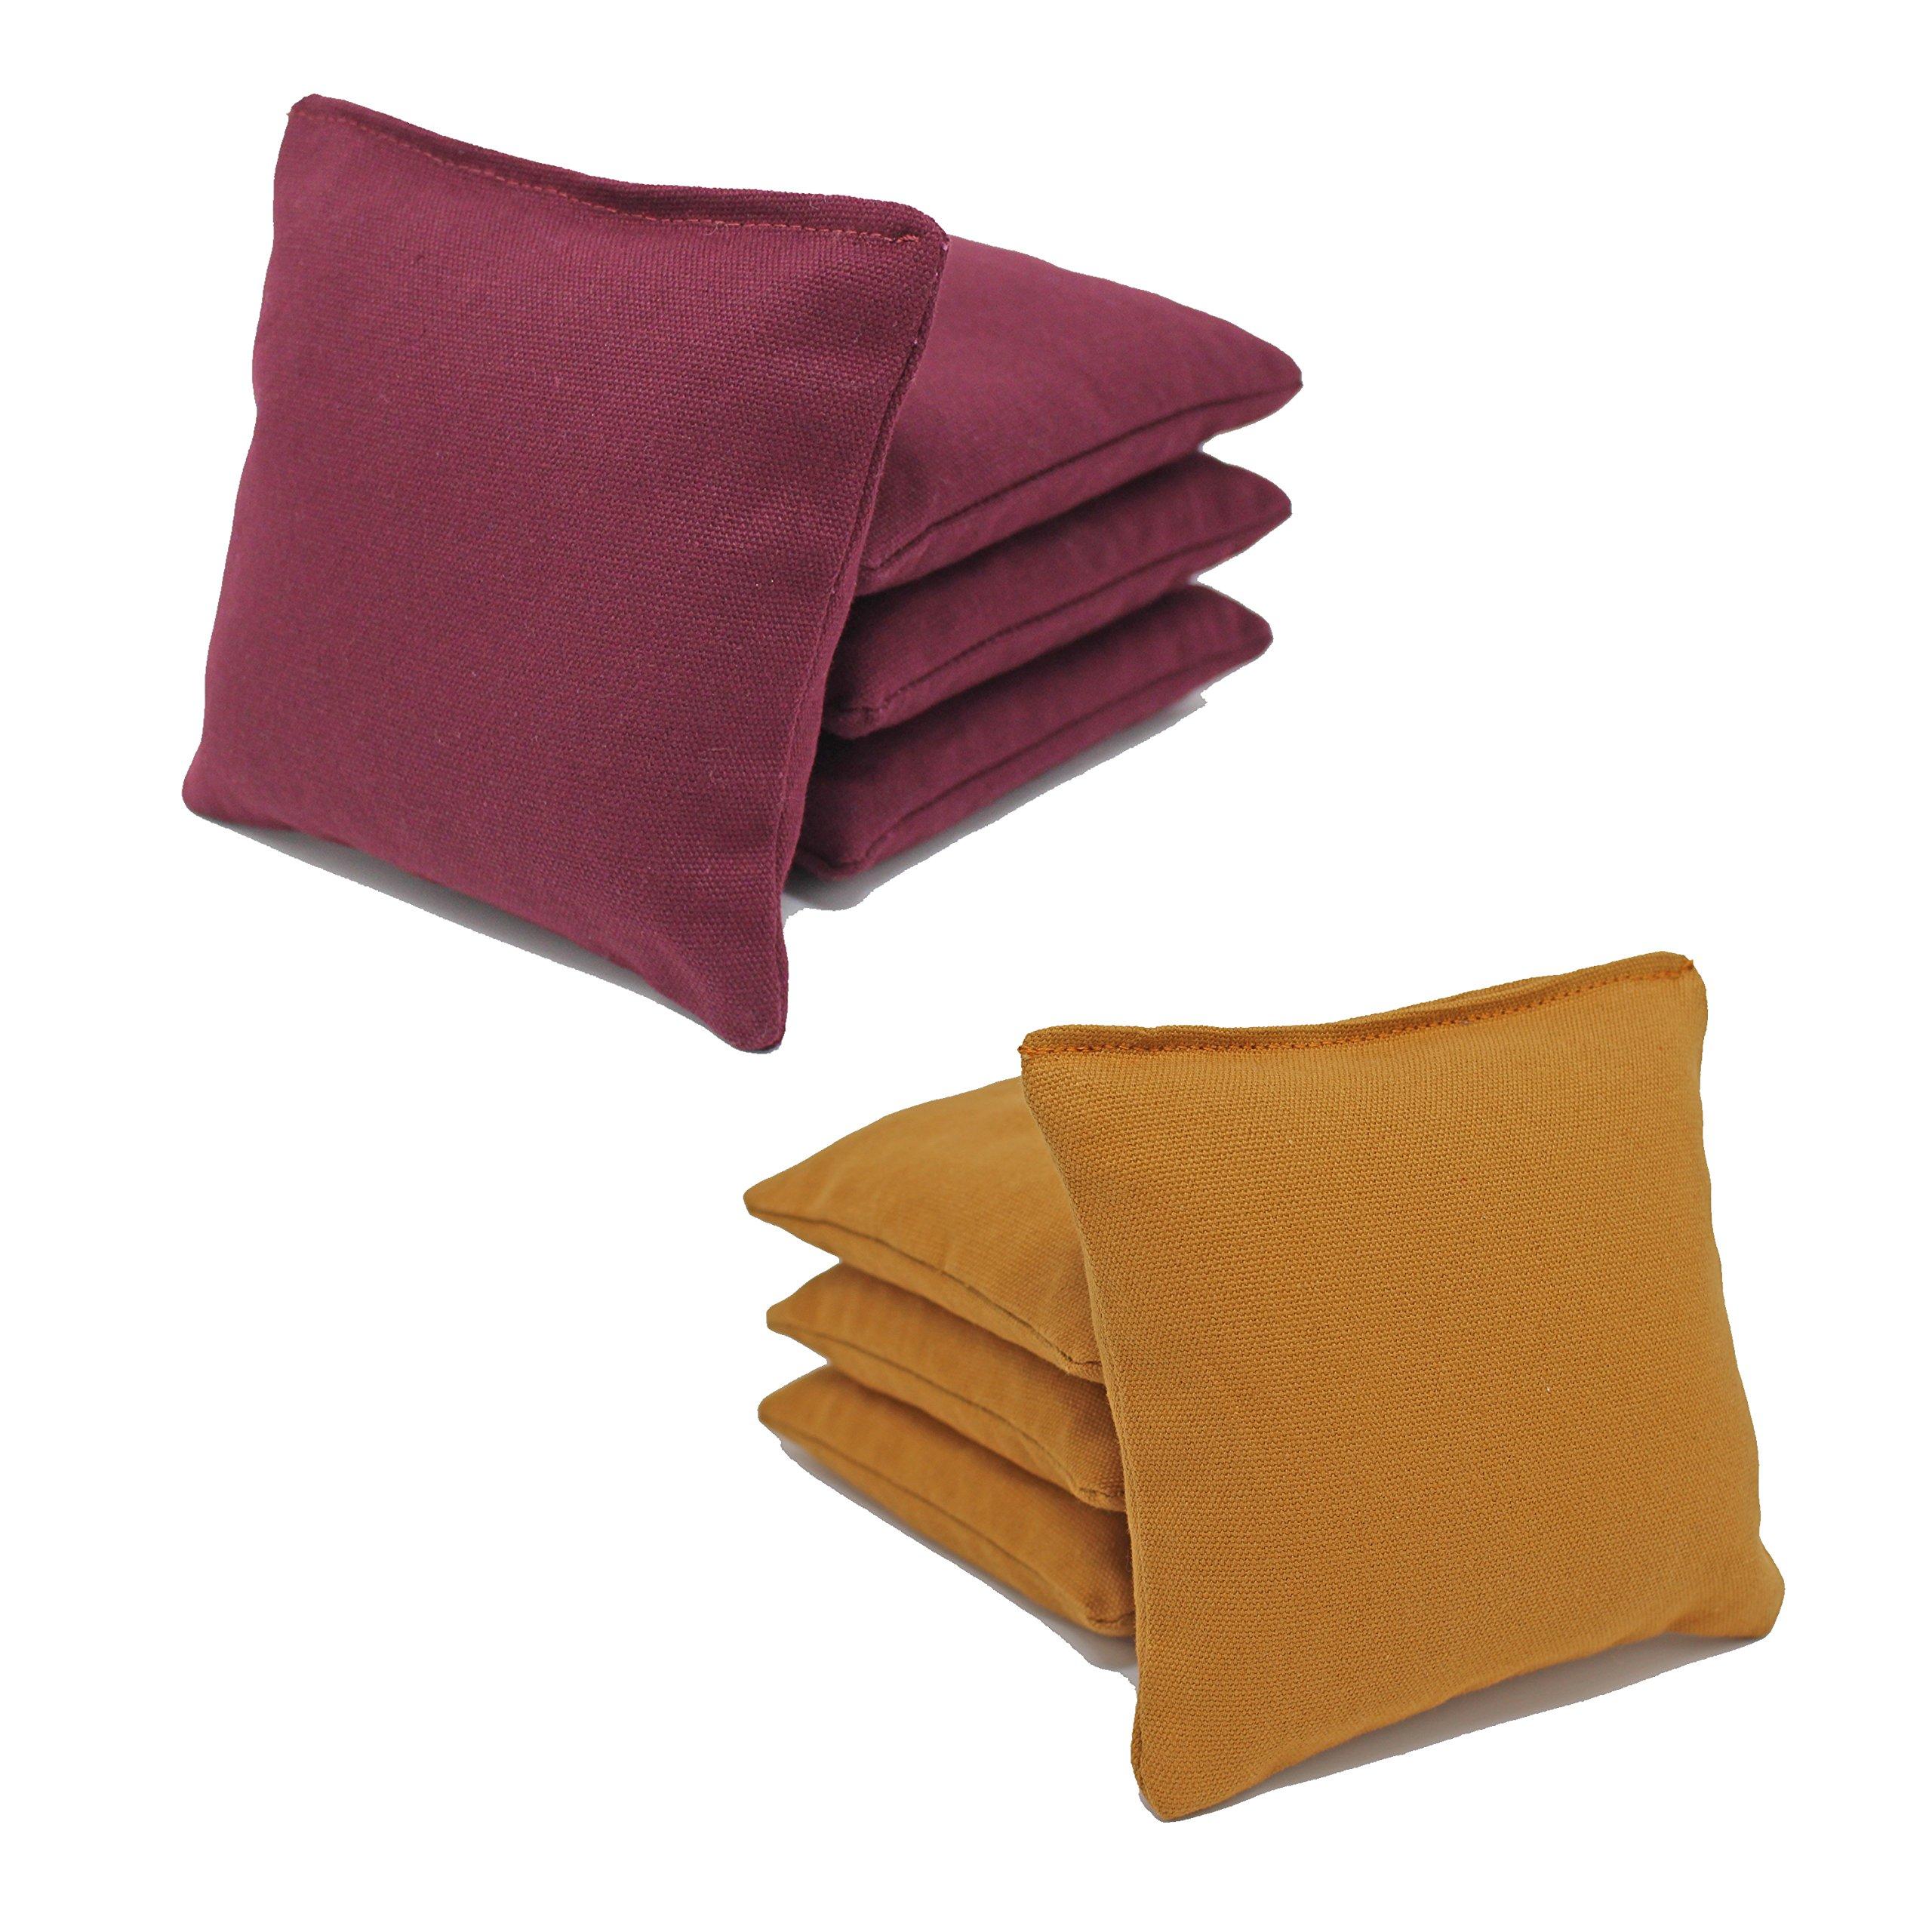 Free Donkey Sports Cornhole Bags (Pack of 8), Gold/Burgundy, Regular by Free Donkey Sports